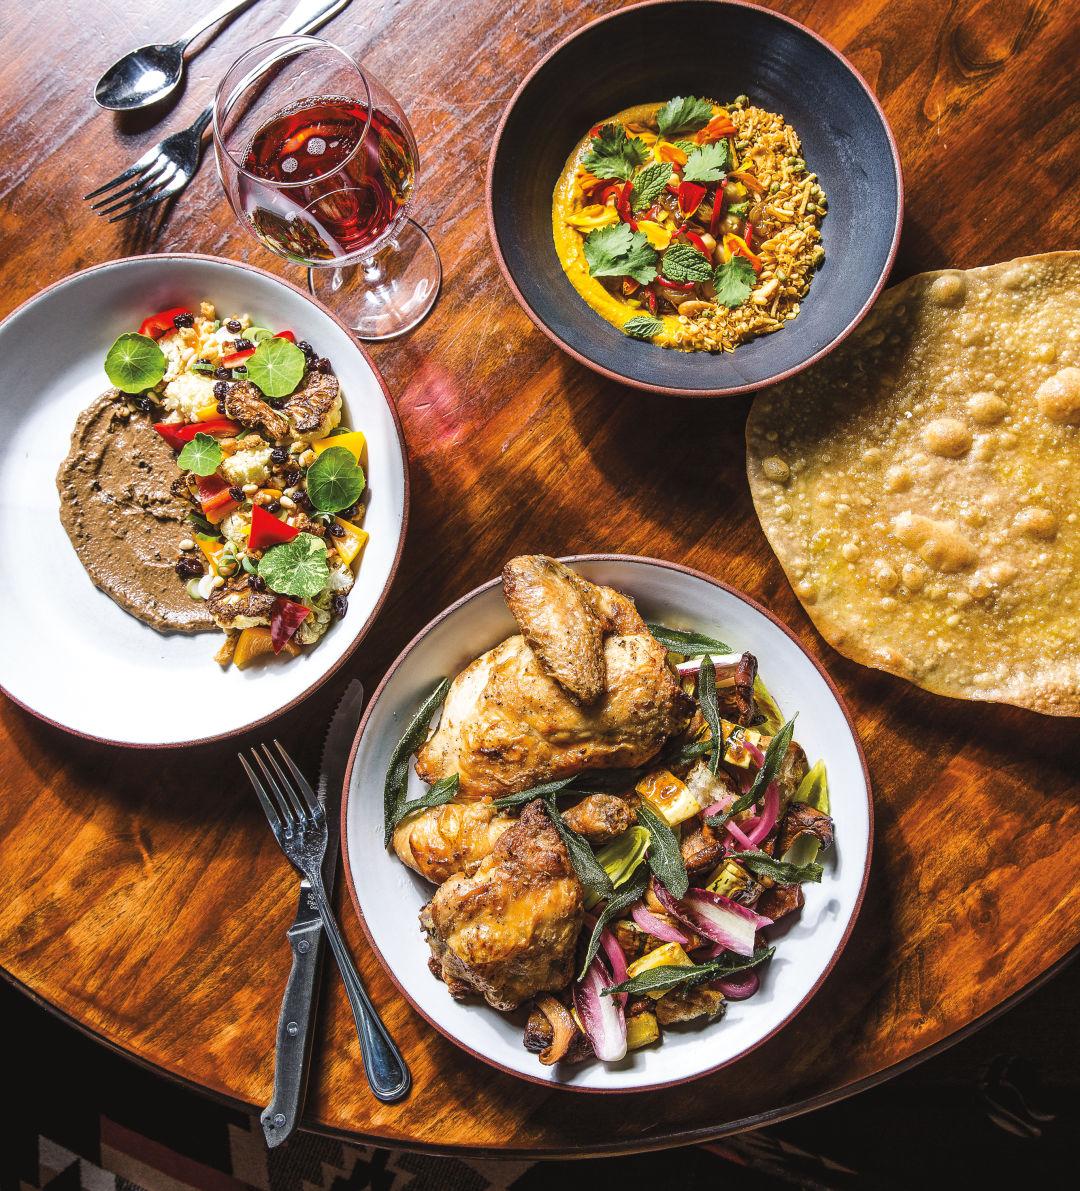 Portland S Best New Restaurants 2018 At Oui Wine Bar More